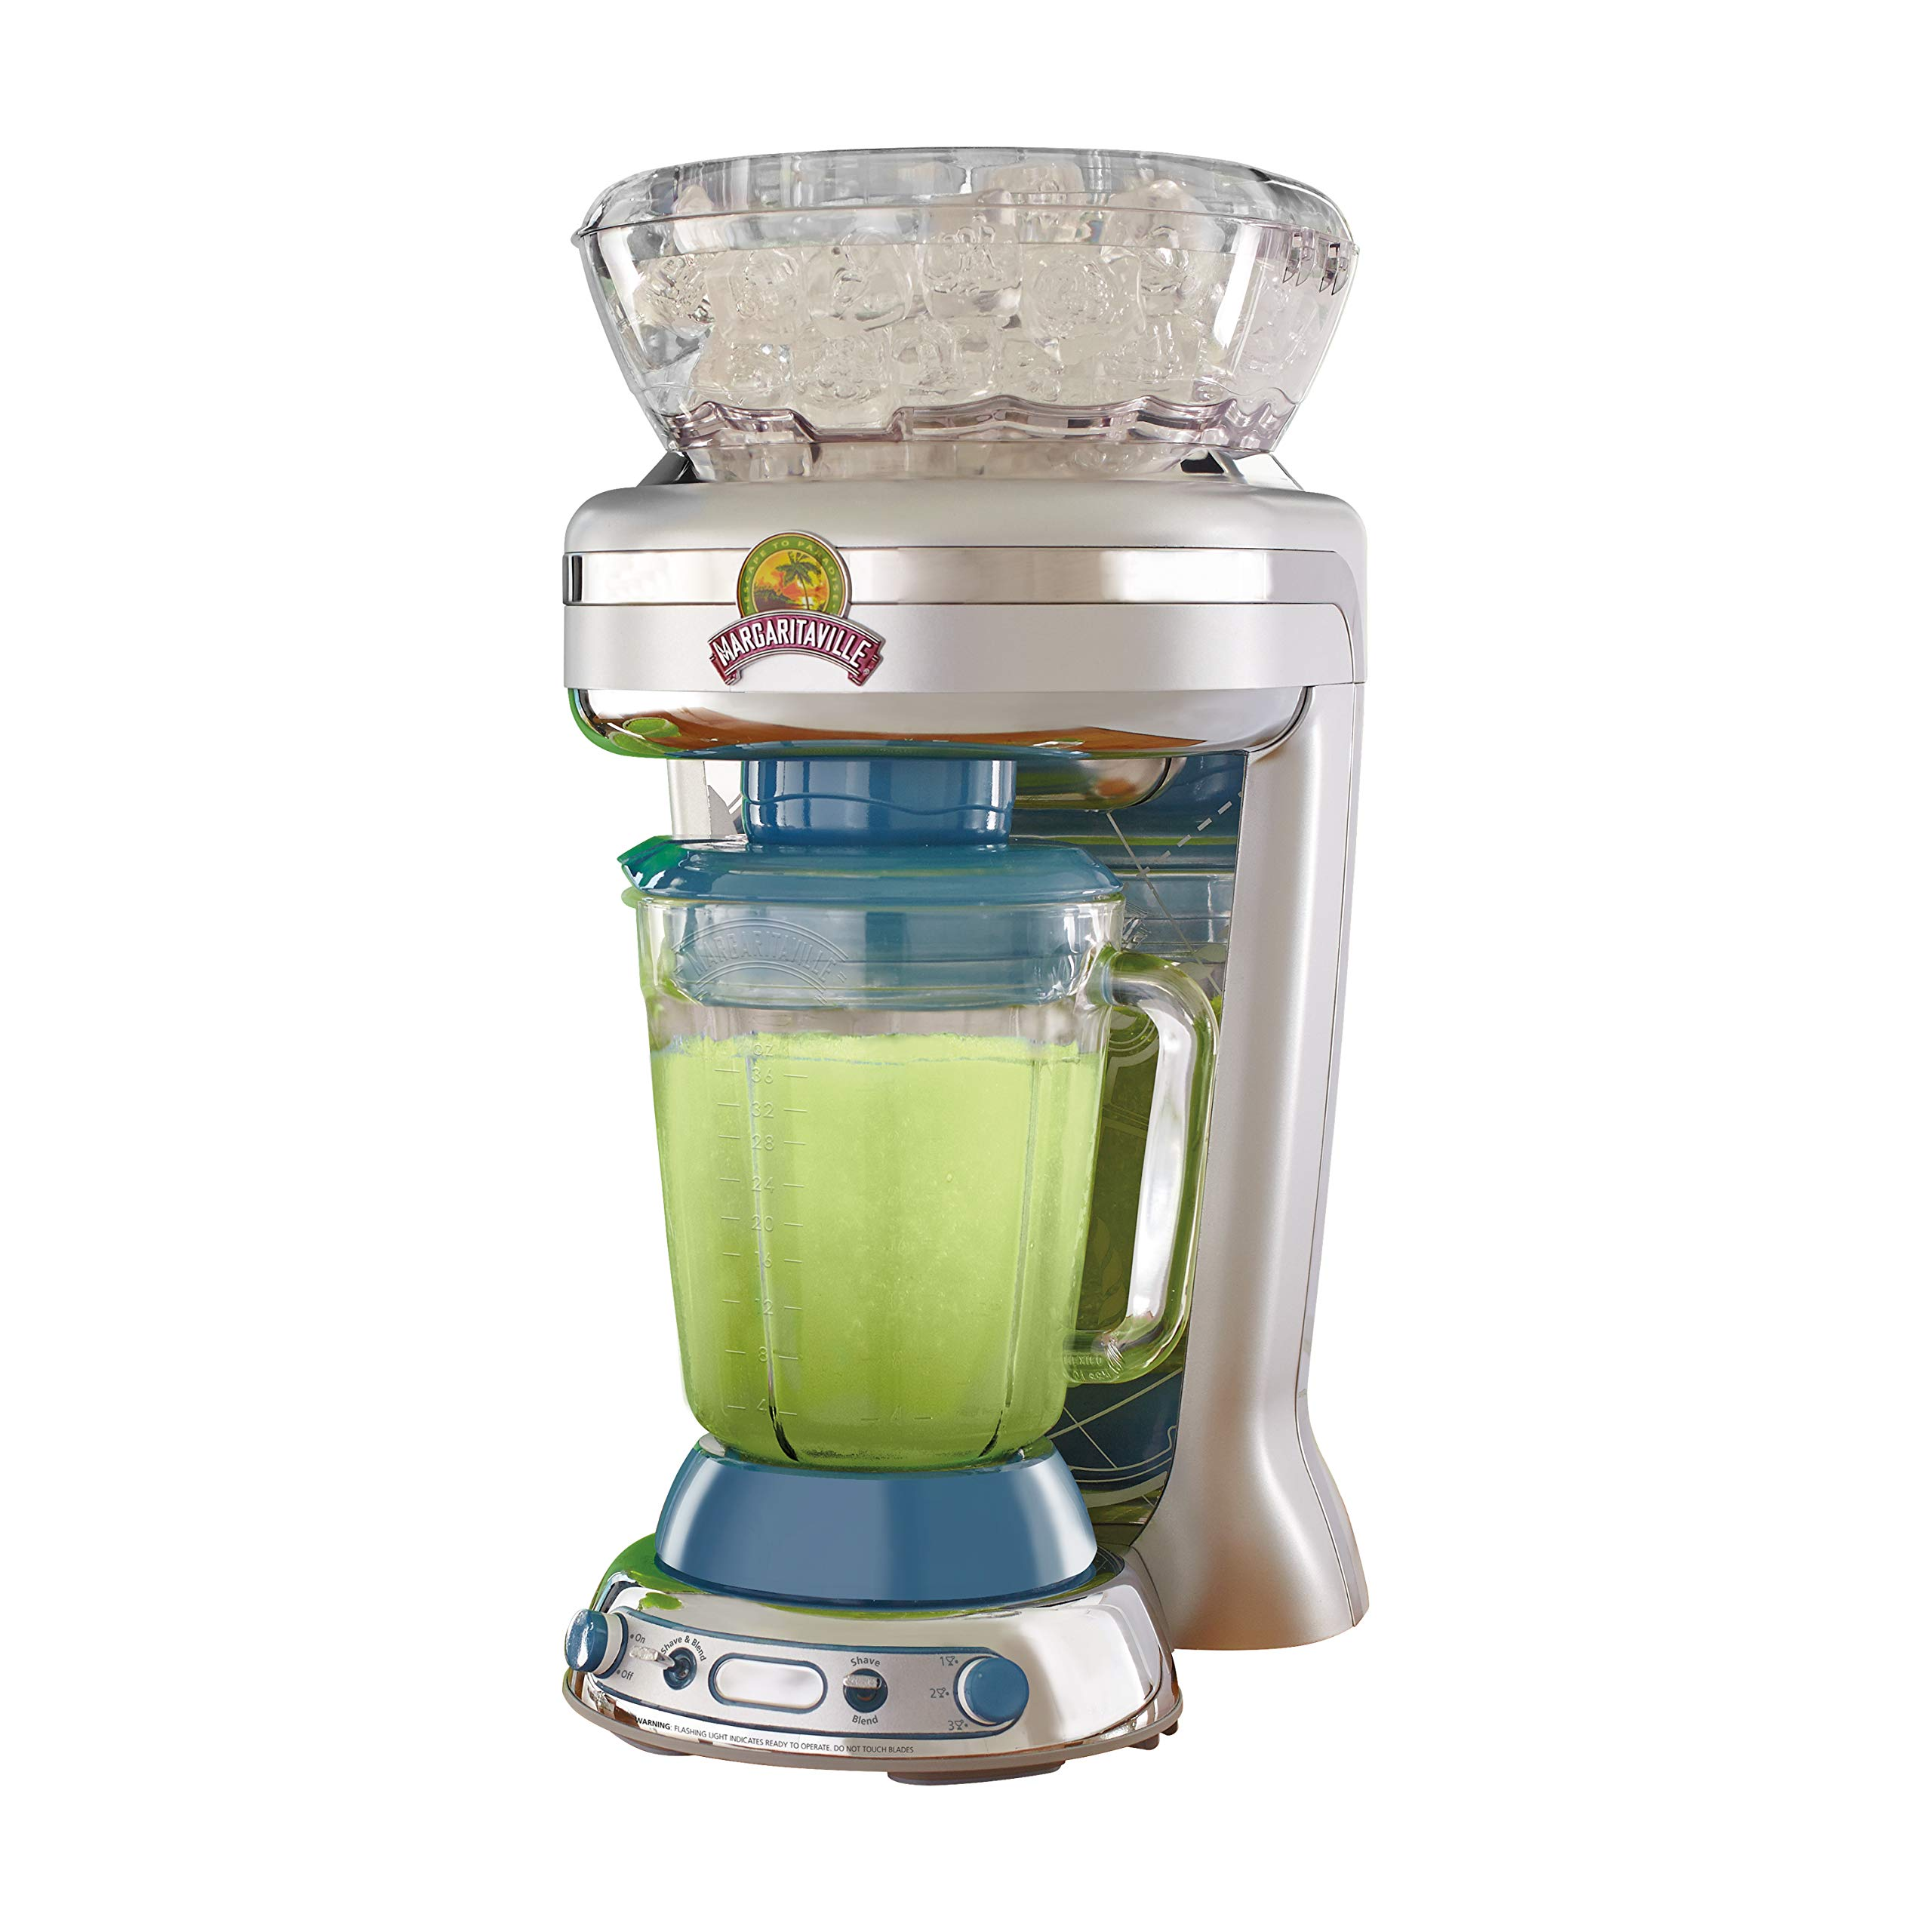 Margaritaville Key West Frozen Concoction Maker with Easy Pour Jar and XL Ice Reservoir by Margaritaville